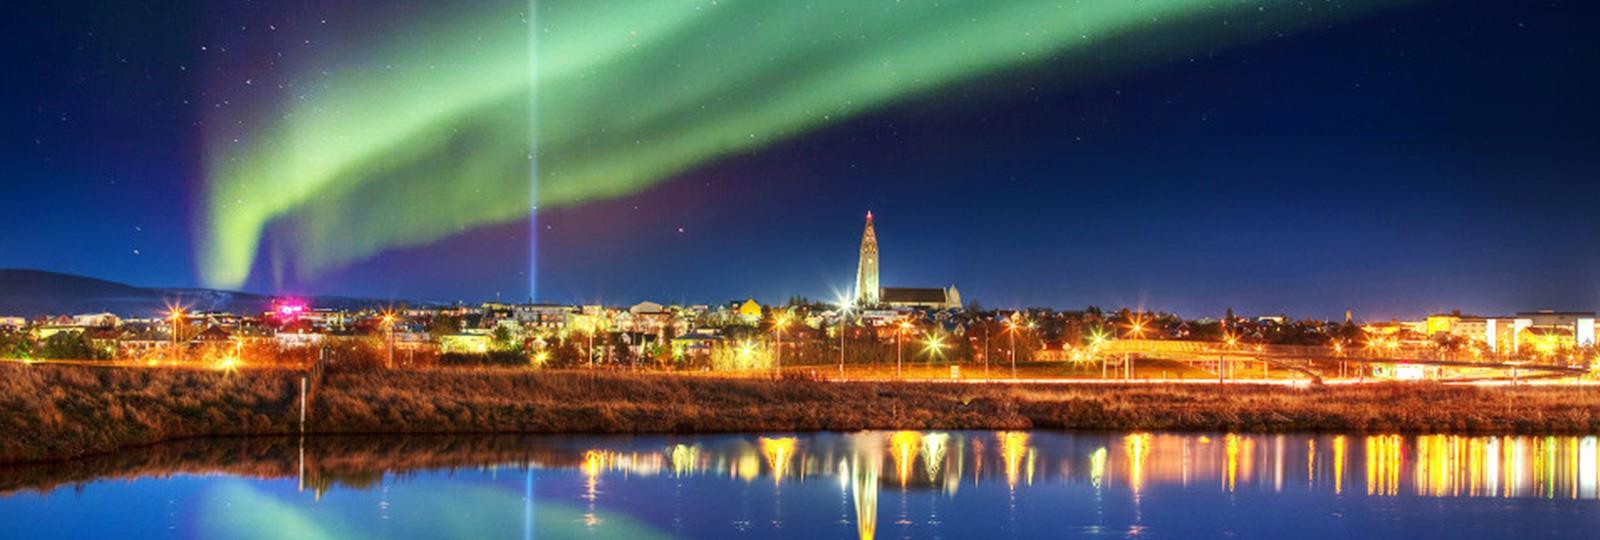 https://travel.ekupi.eu/Images/sliderHorizontal/hoteloffers/Hoteli_pp_1600x540_reykjavik.jpg